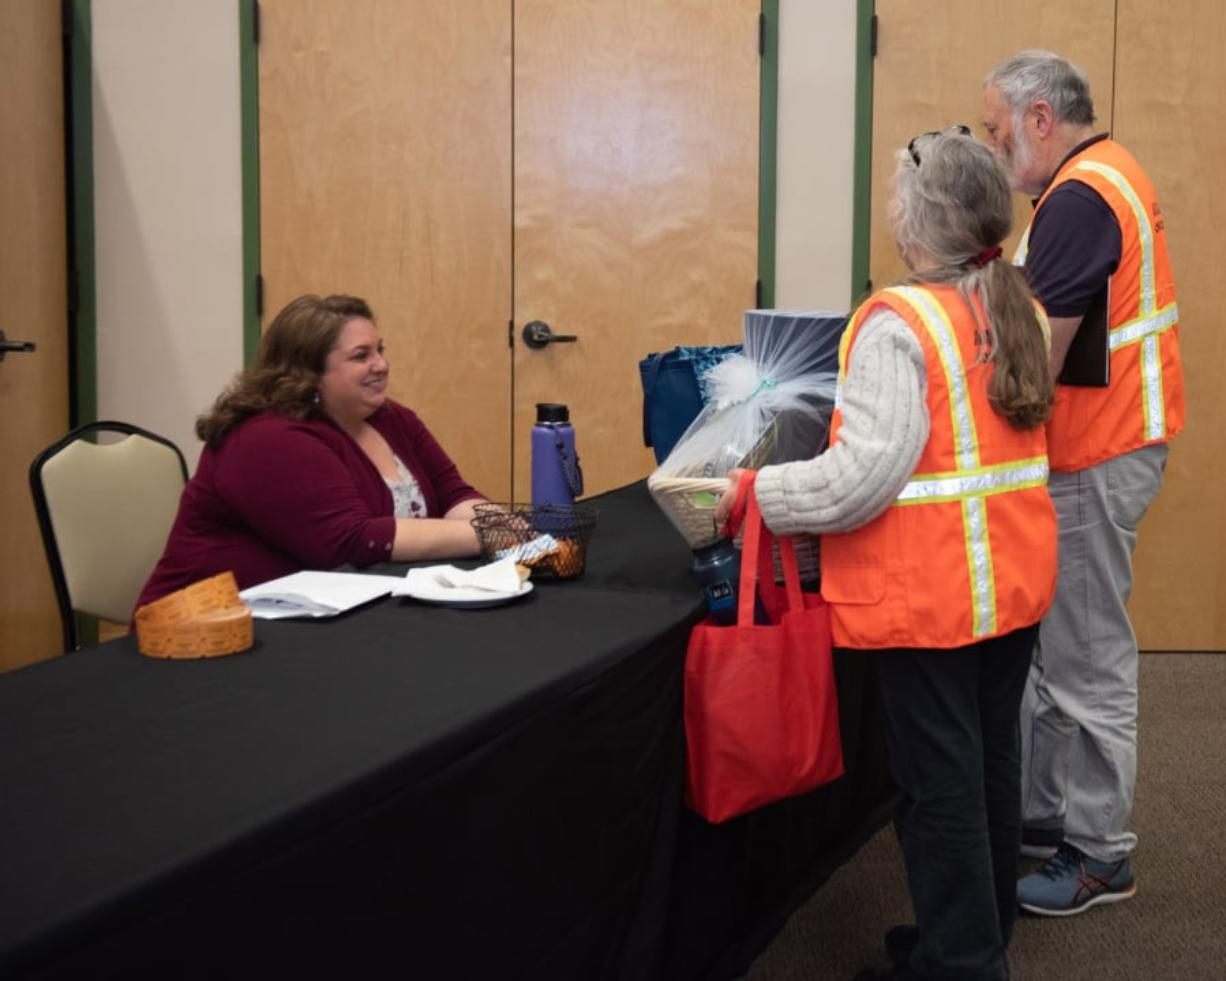 Lianne Martinez, emergency preparedness coordinator at Clark County Public Health, speaks with volunteers at a ceremony Thursday night at St. Joseph Catholic Church's parish hall.